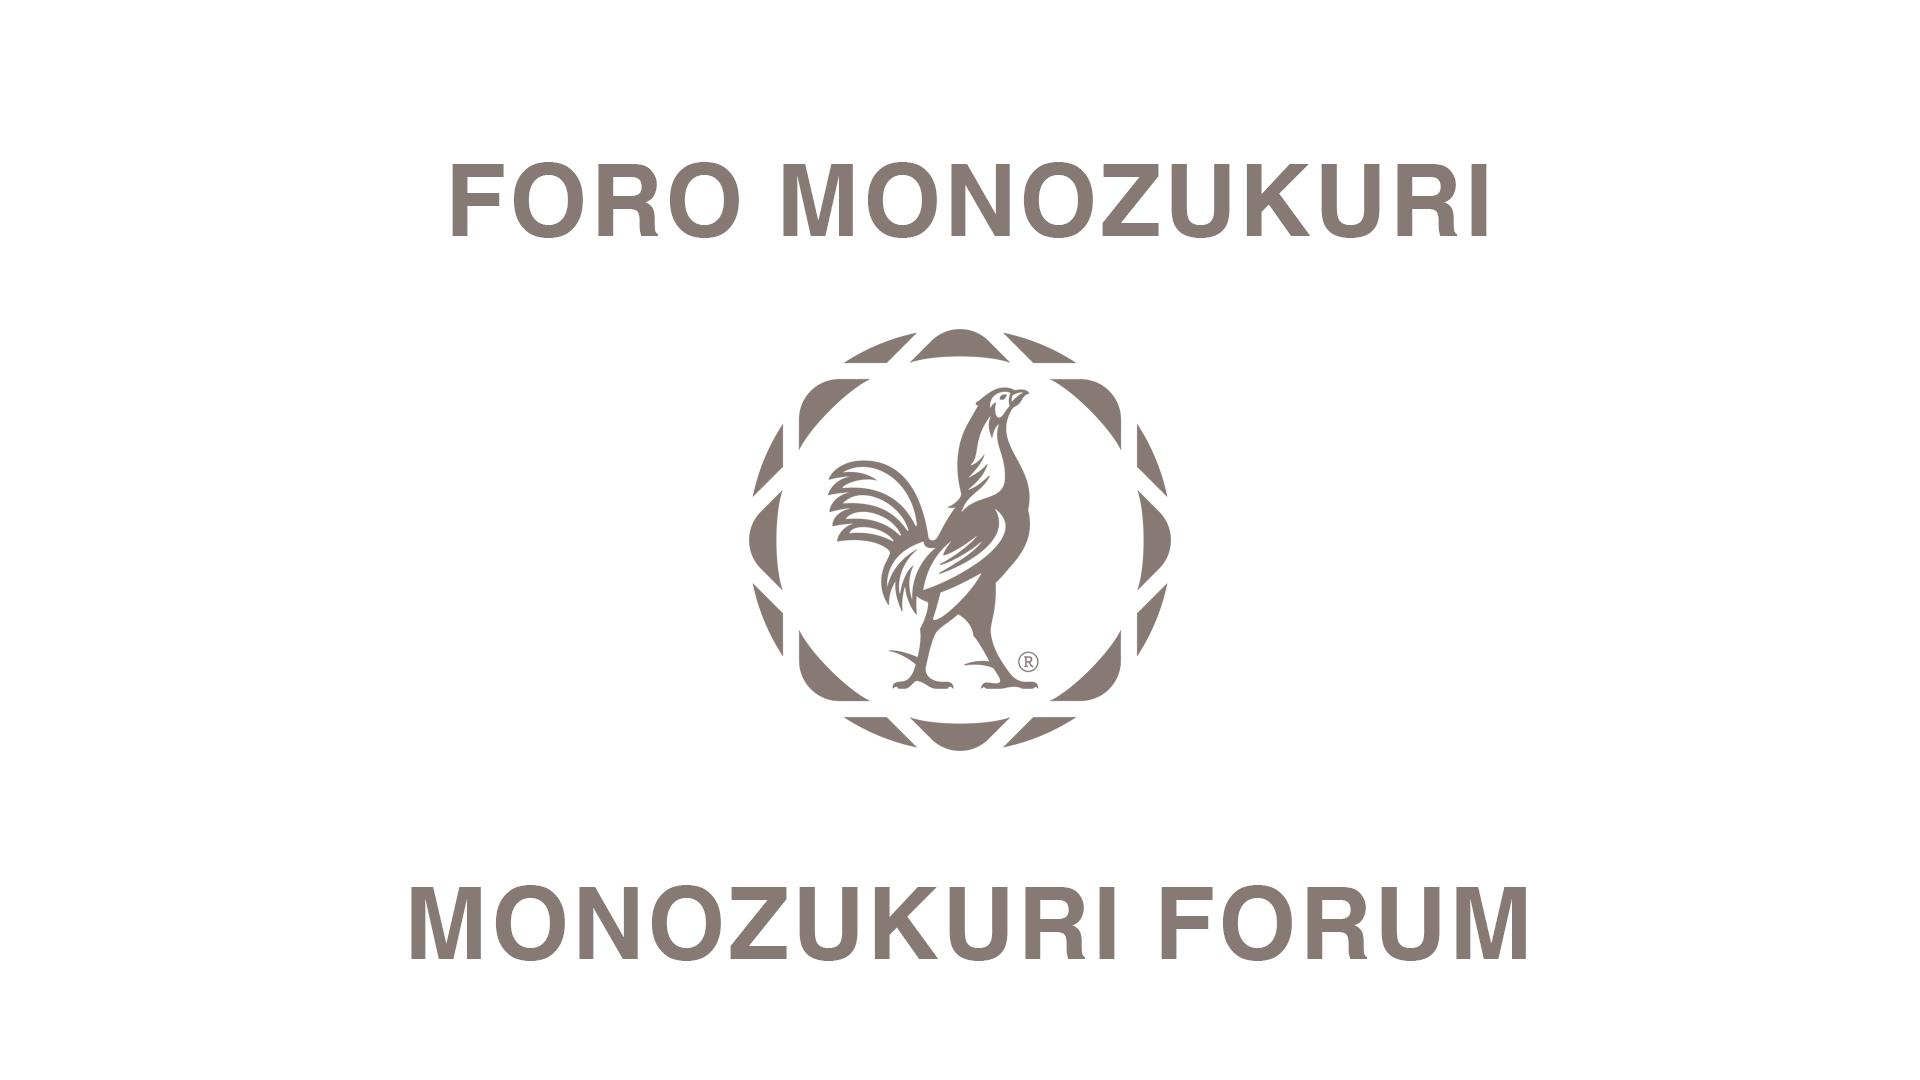 FORO-Monozukuri